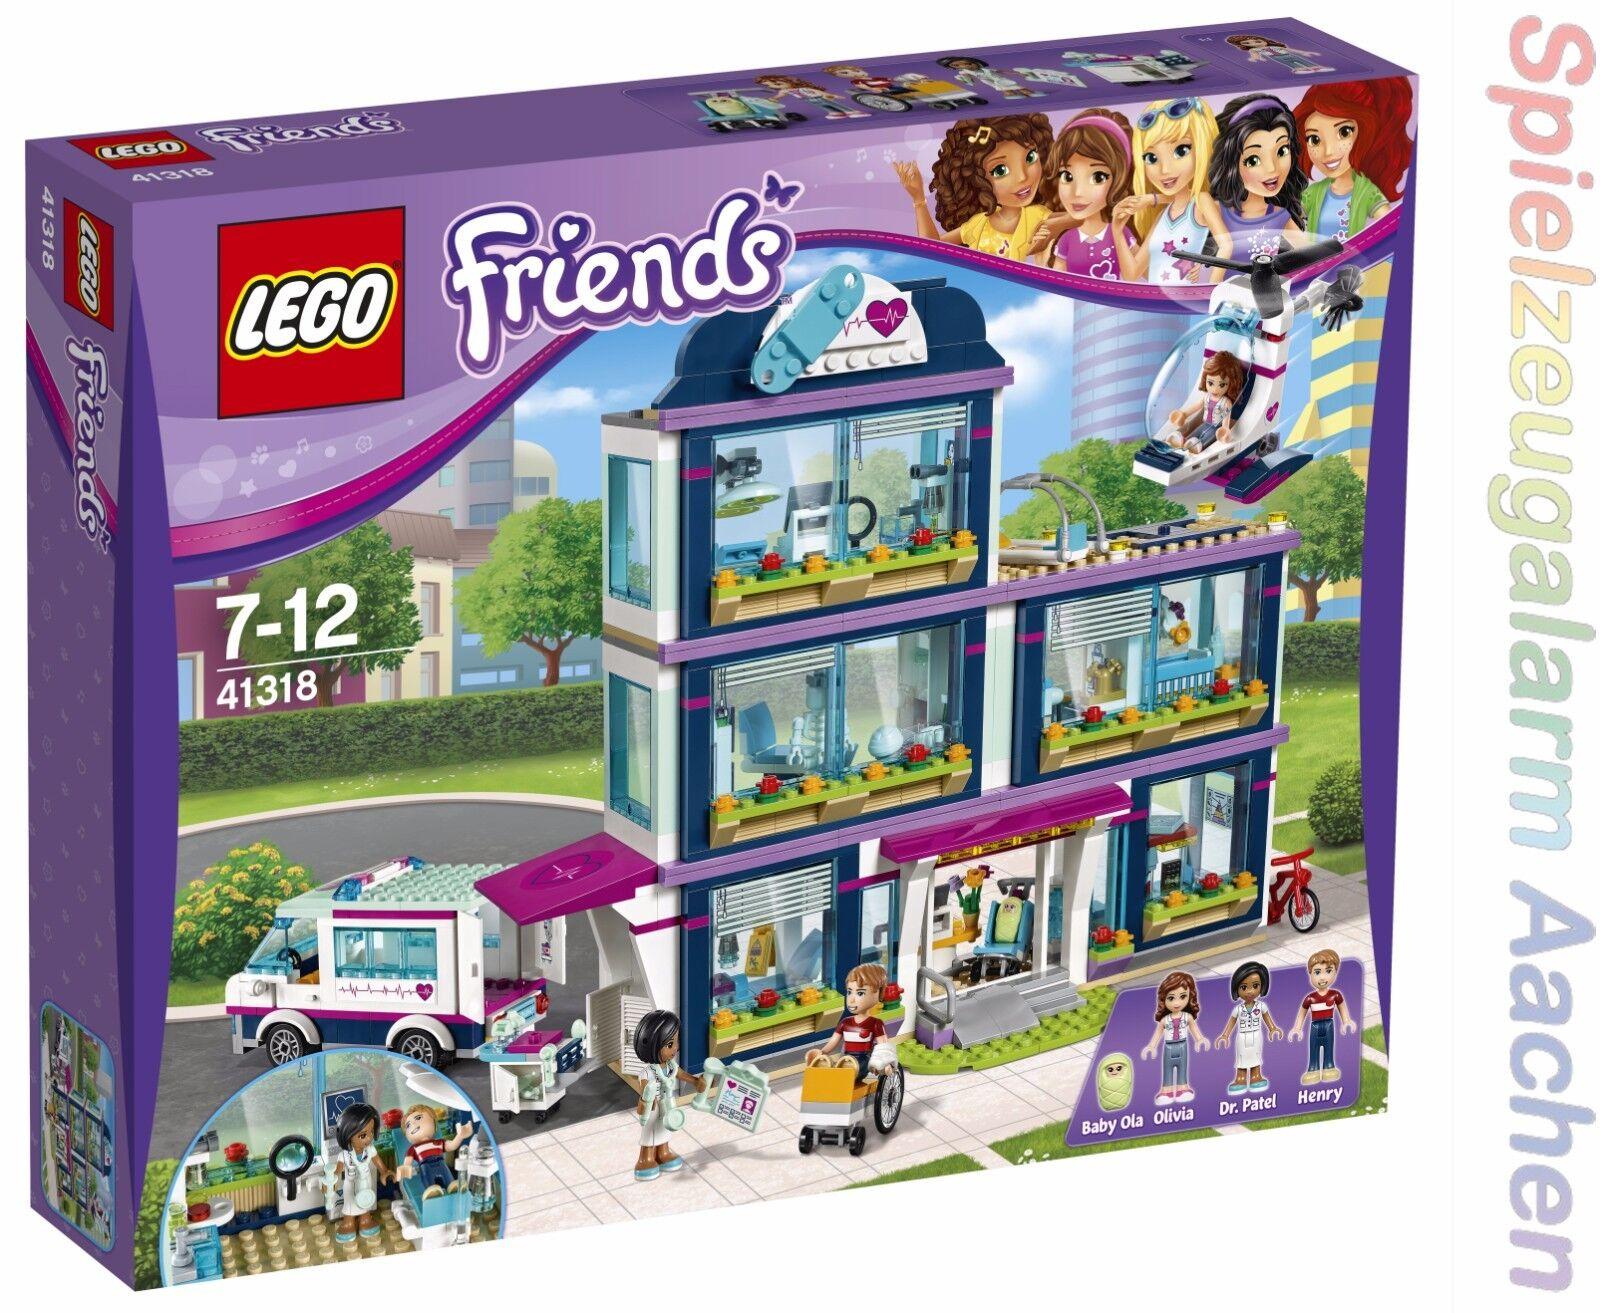 Lego Friends 41318 Heartlake hospital hospital l 'hospital d' Heartlake n7 17